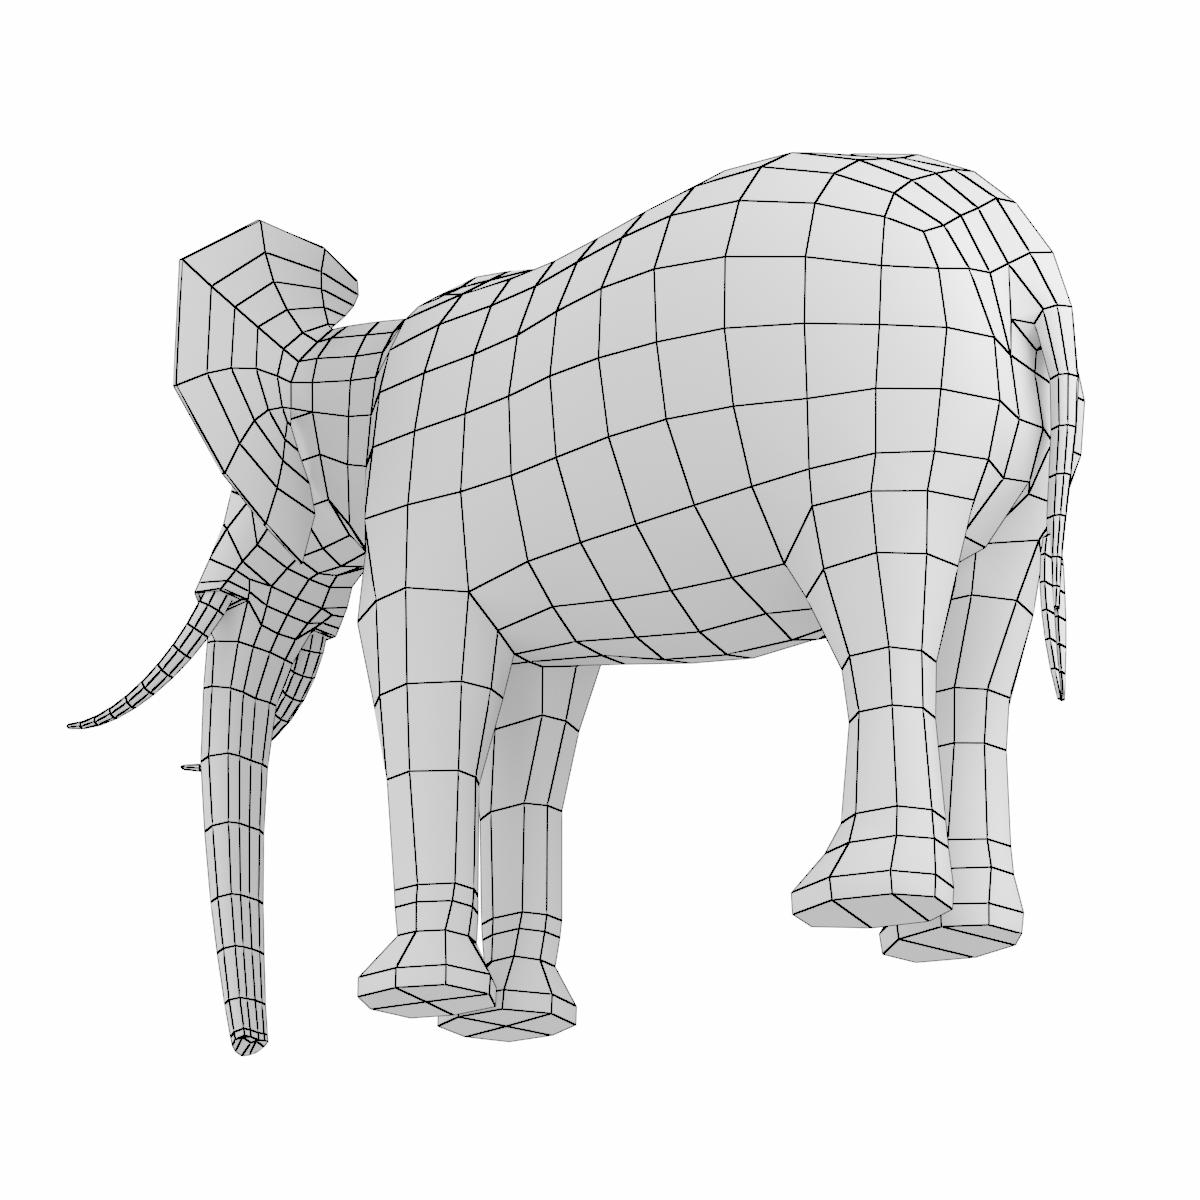 African Bush Elephant Male Animal By Vk Studio 3docean